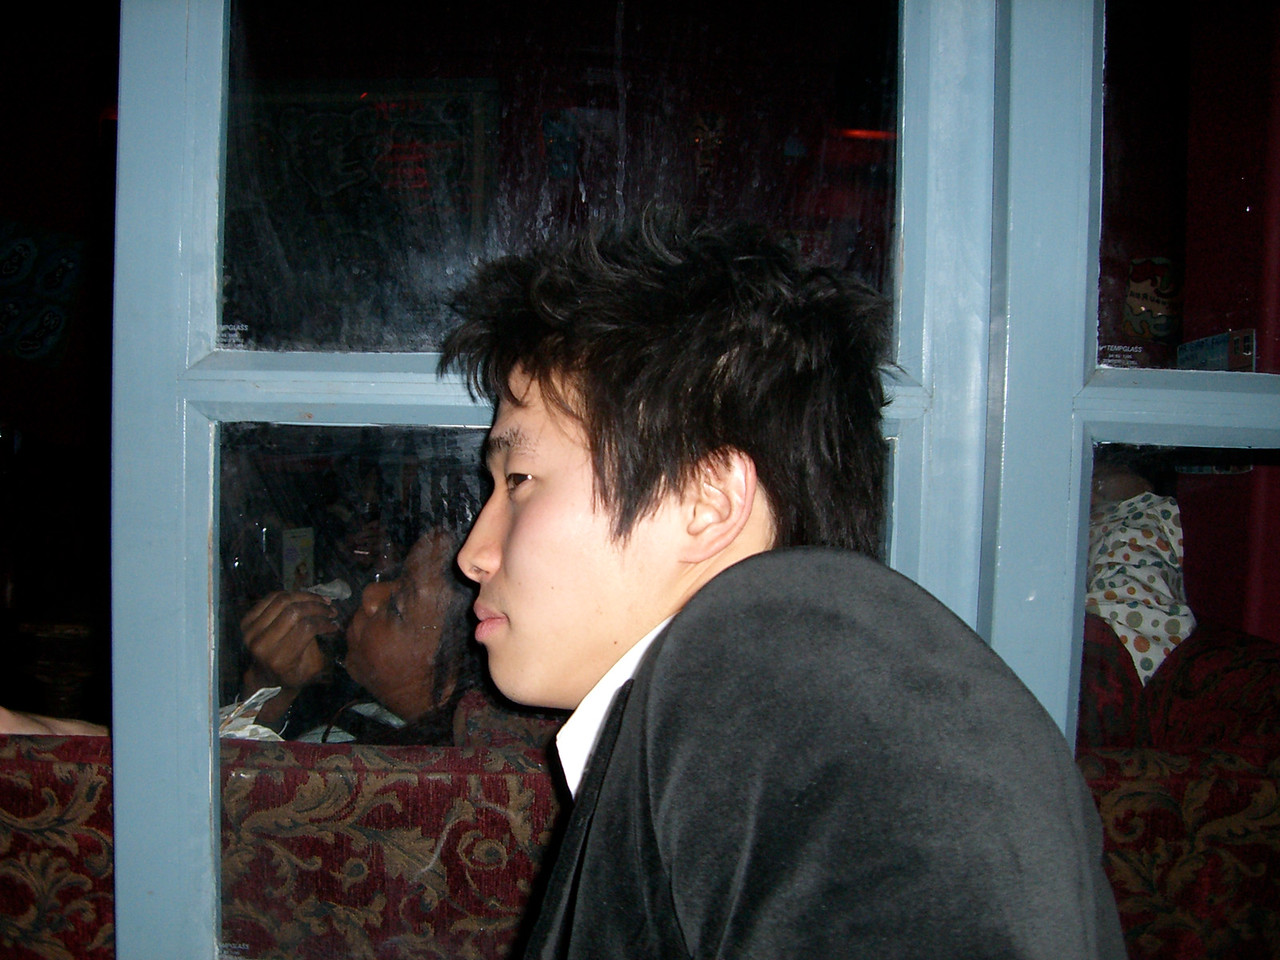 2006 01 22 Sun - Hyungsoo Kim tests the open window's soundproofness